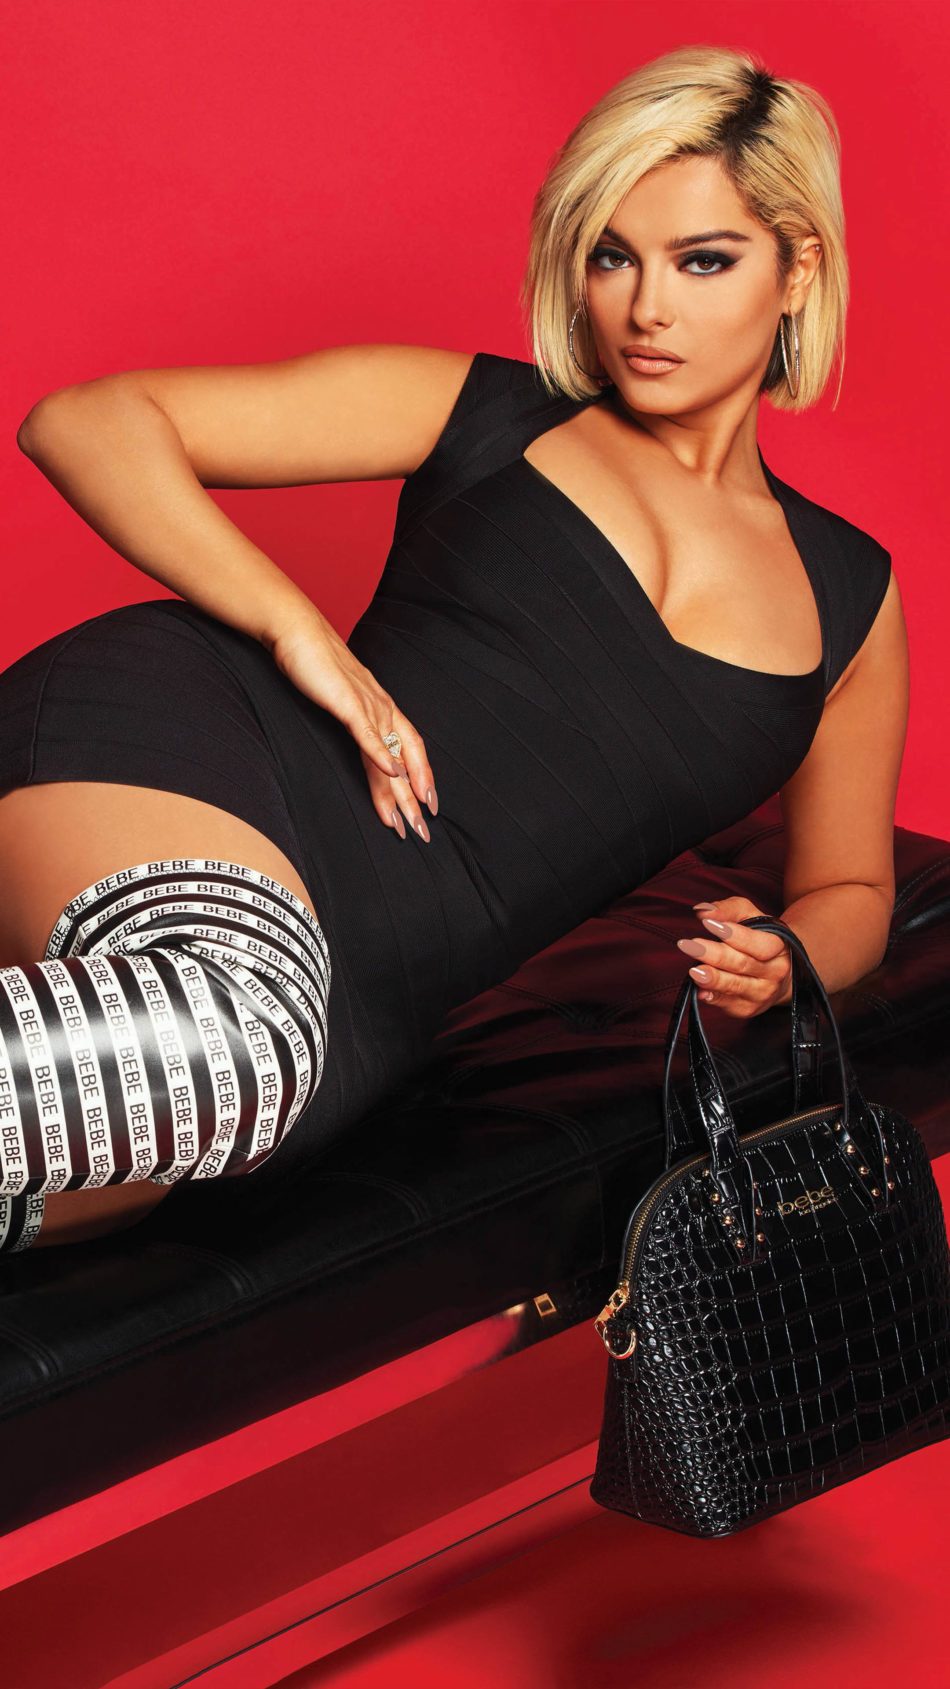 Bebe Rexha Black Dress Red Background 4K Ultra HD Mobile Wallpaper